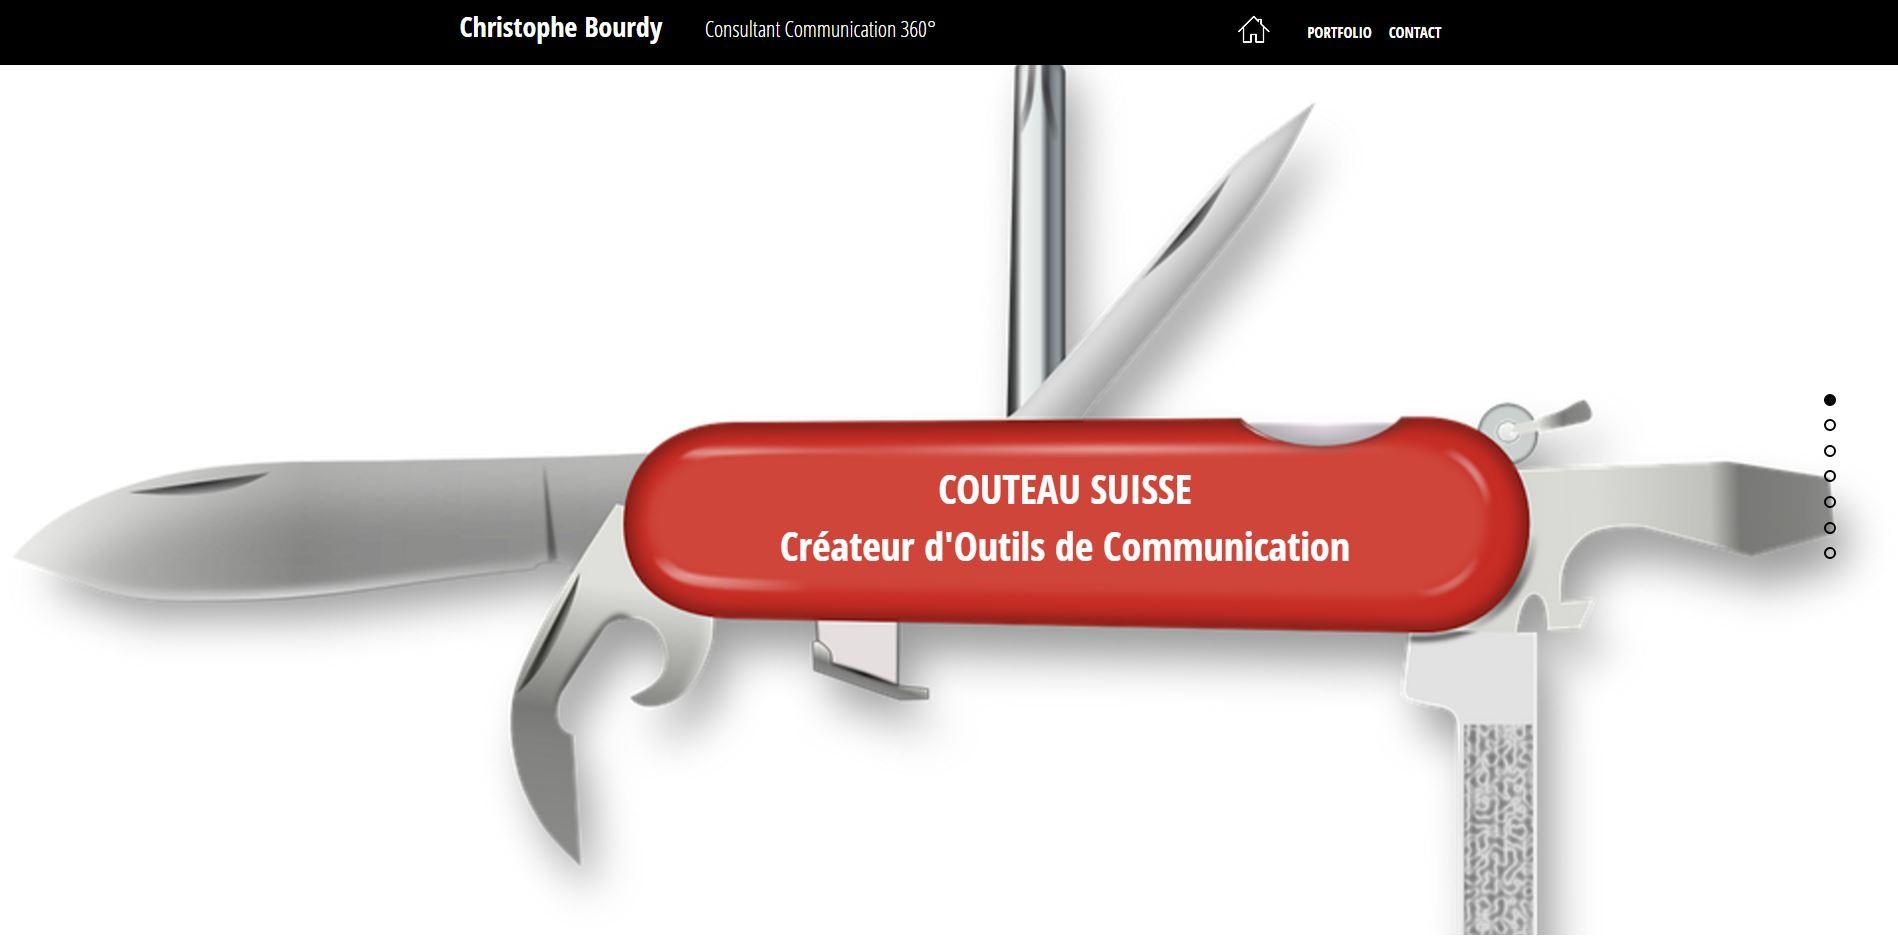 (c) Consultantcommunication.fr